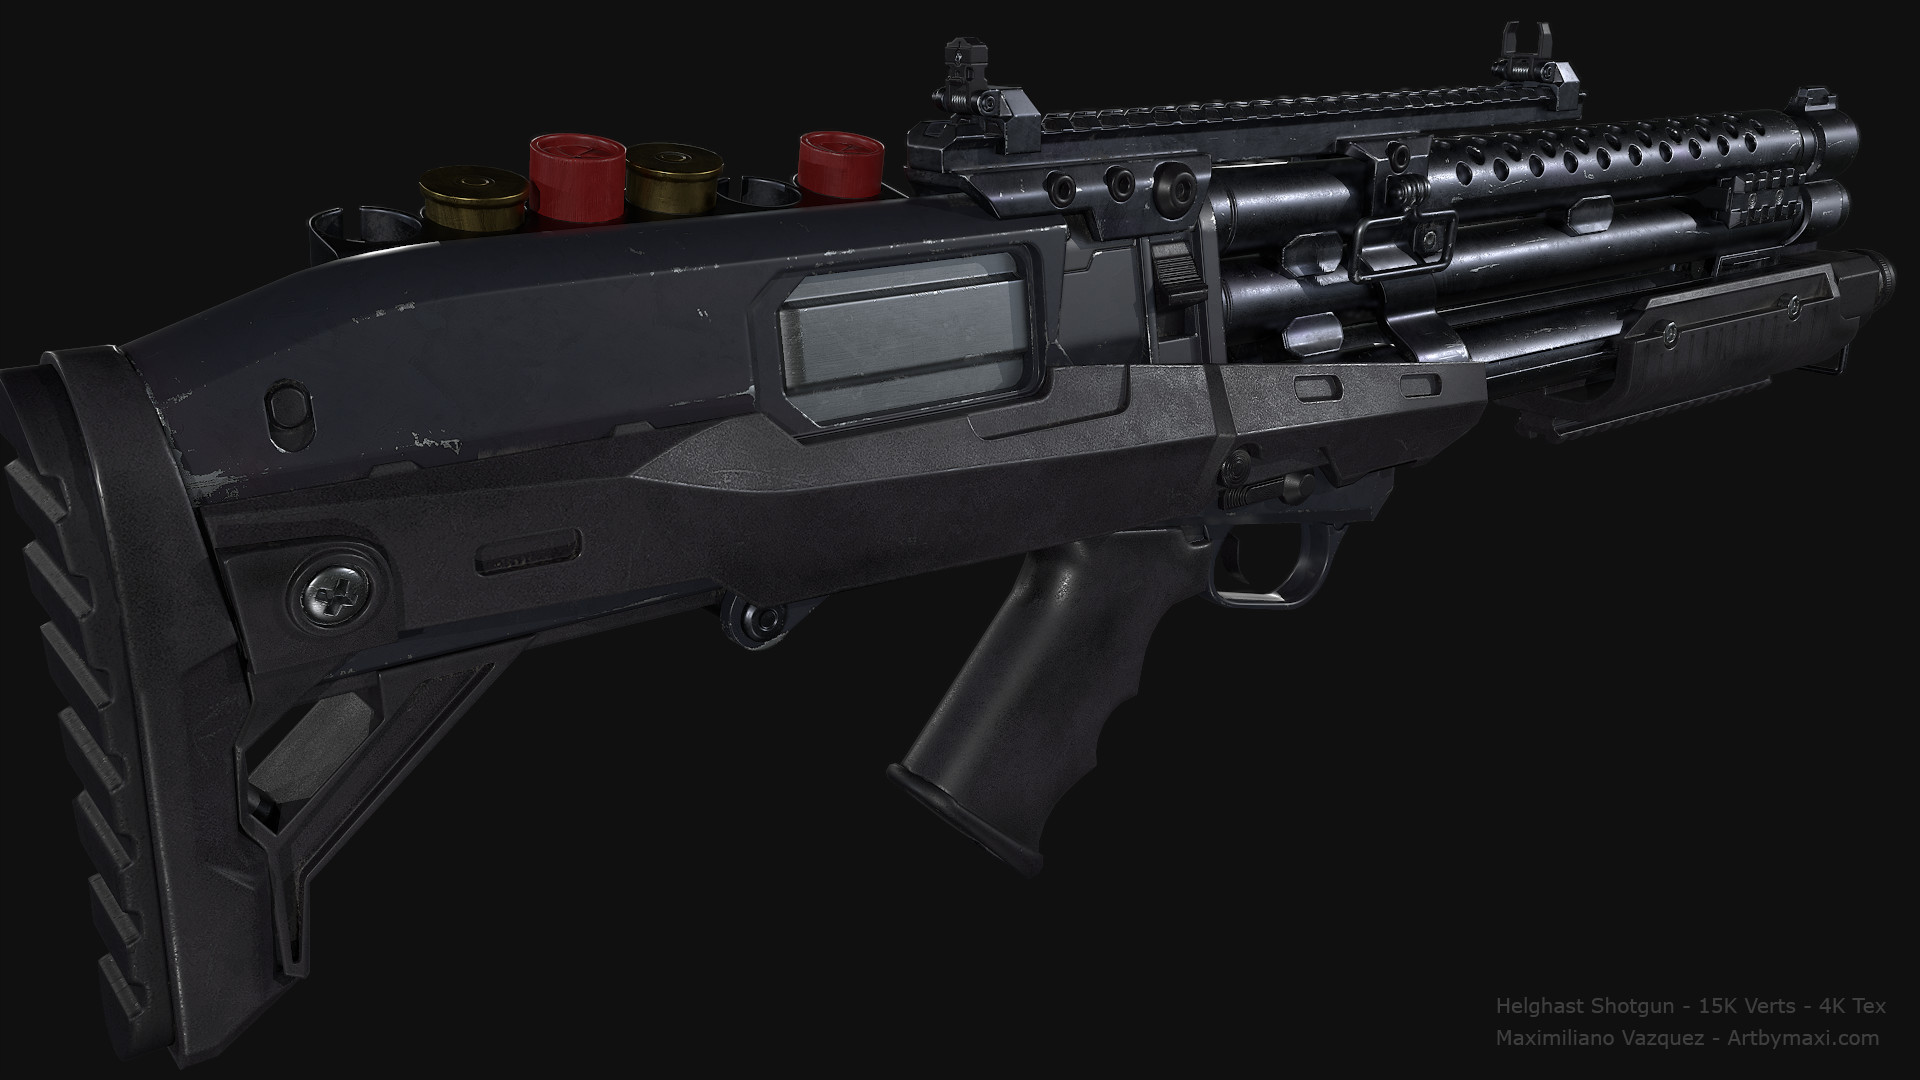 Maximiliano vazquez hellghast shotgun lp5